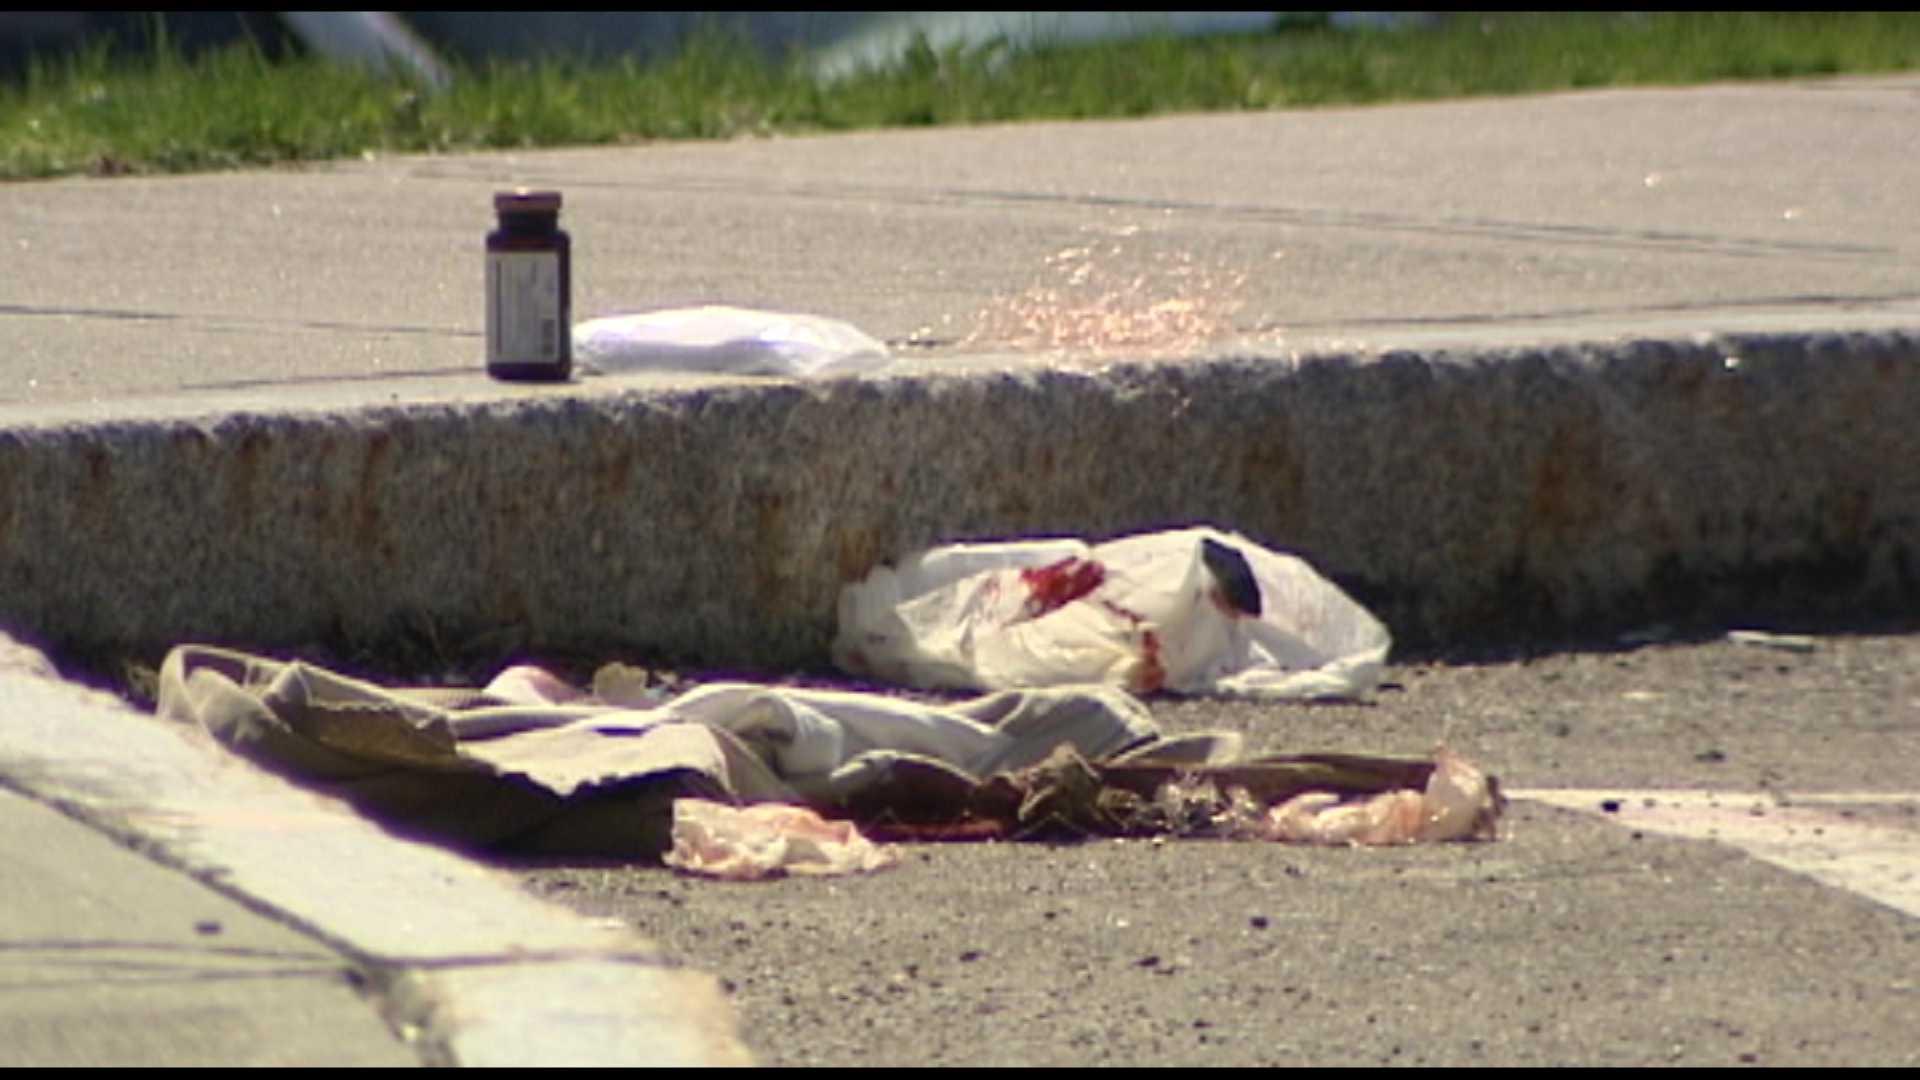 04-25-13 Winooski police officer shoots man in leg - img